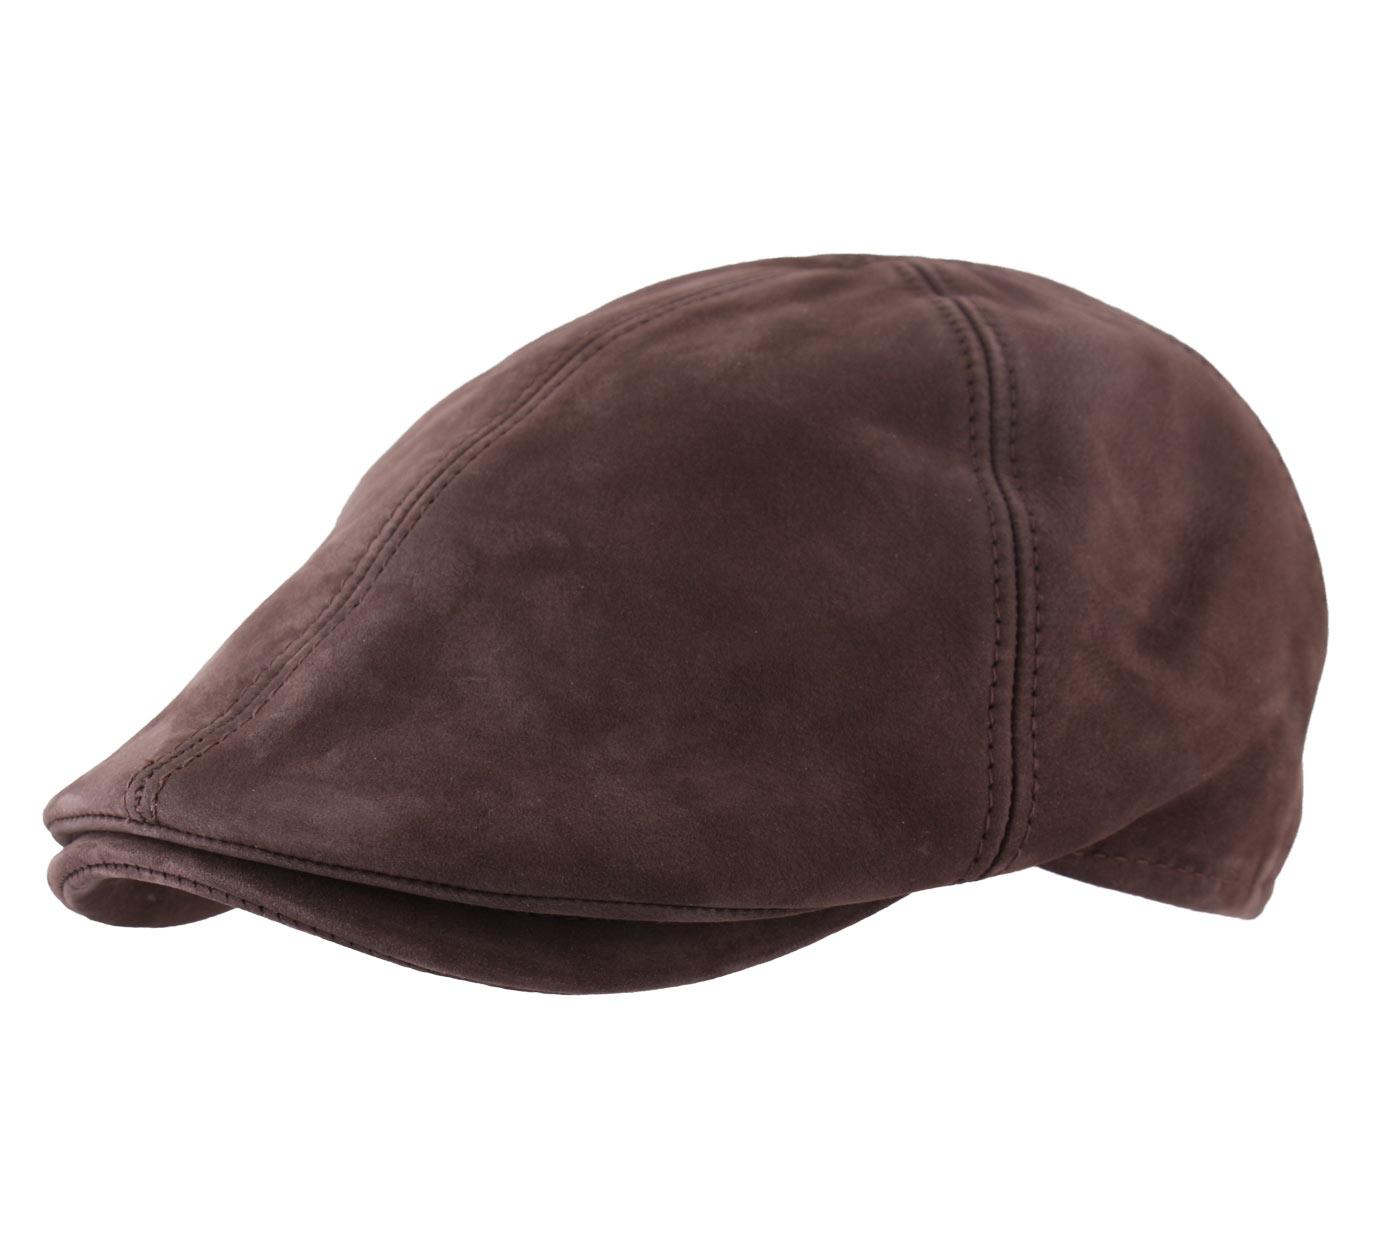 b ret casquette plate cuir homme classic cap cuir marron ebay. Black Bedroom Furniture Sets. Home Design Ideas